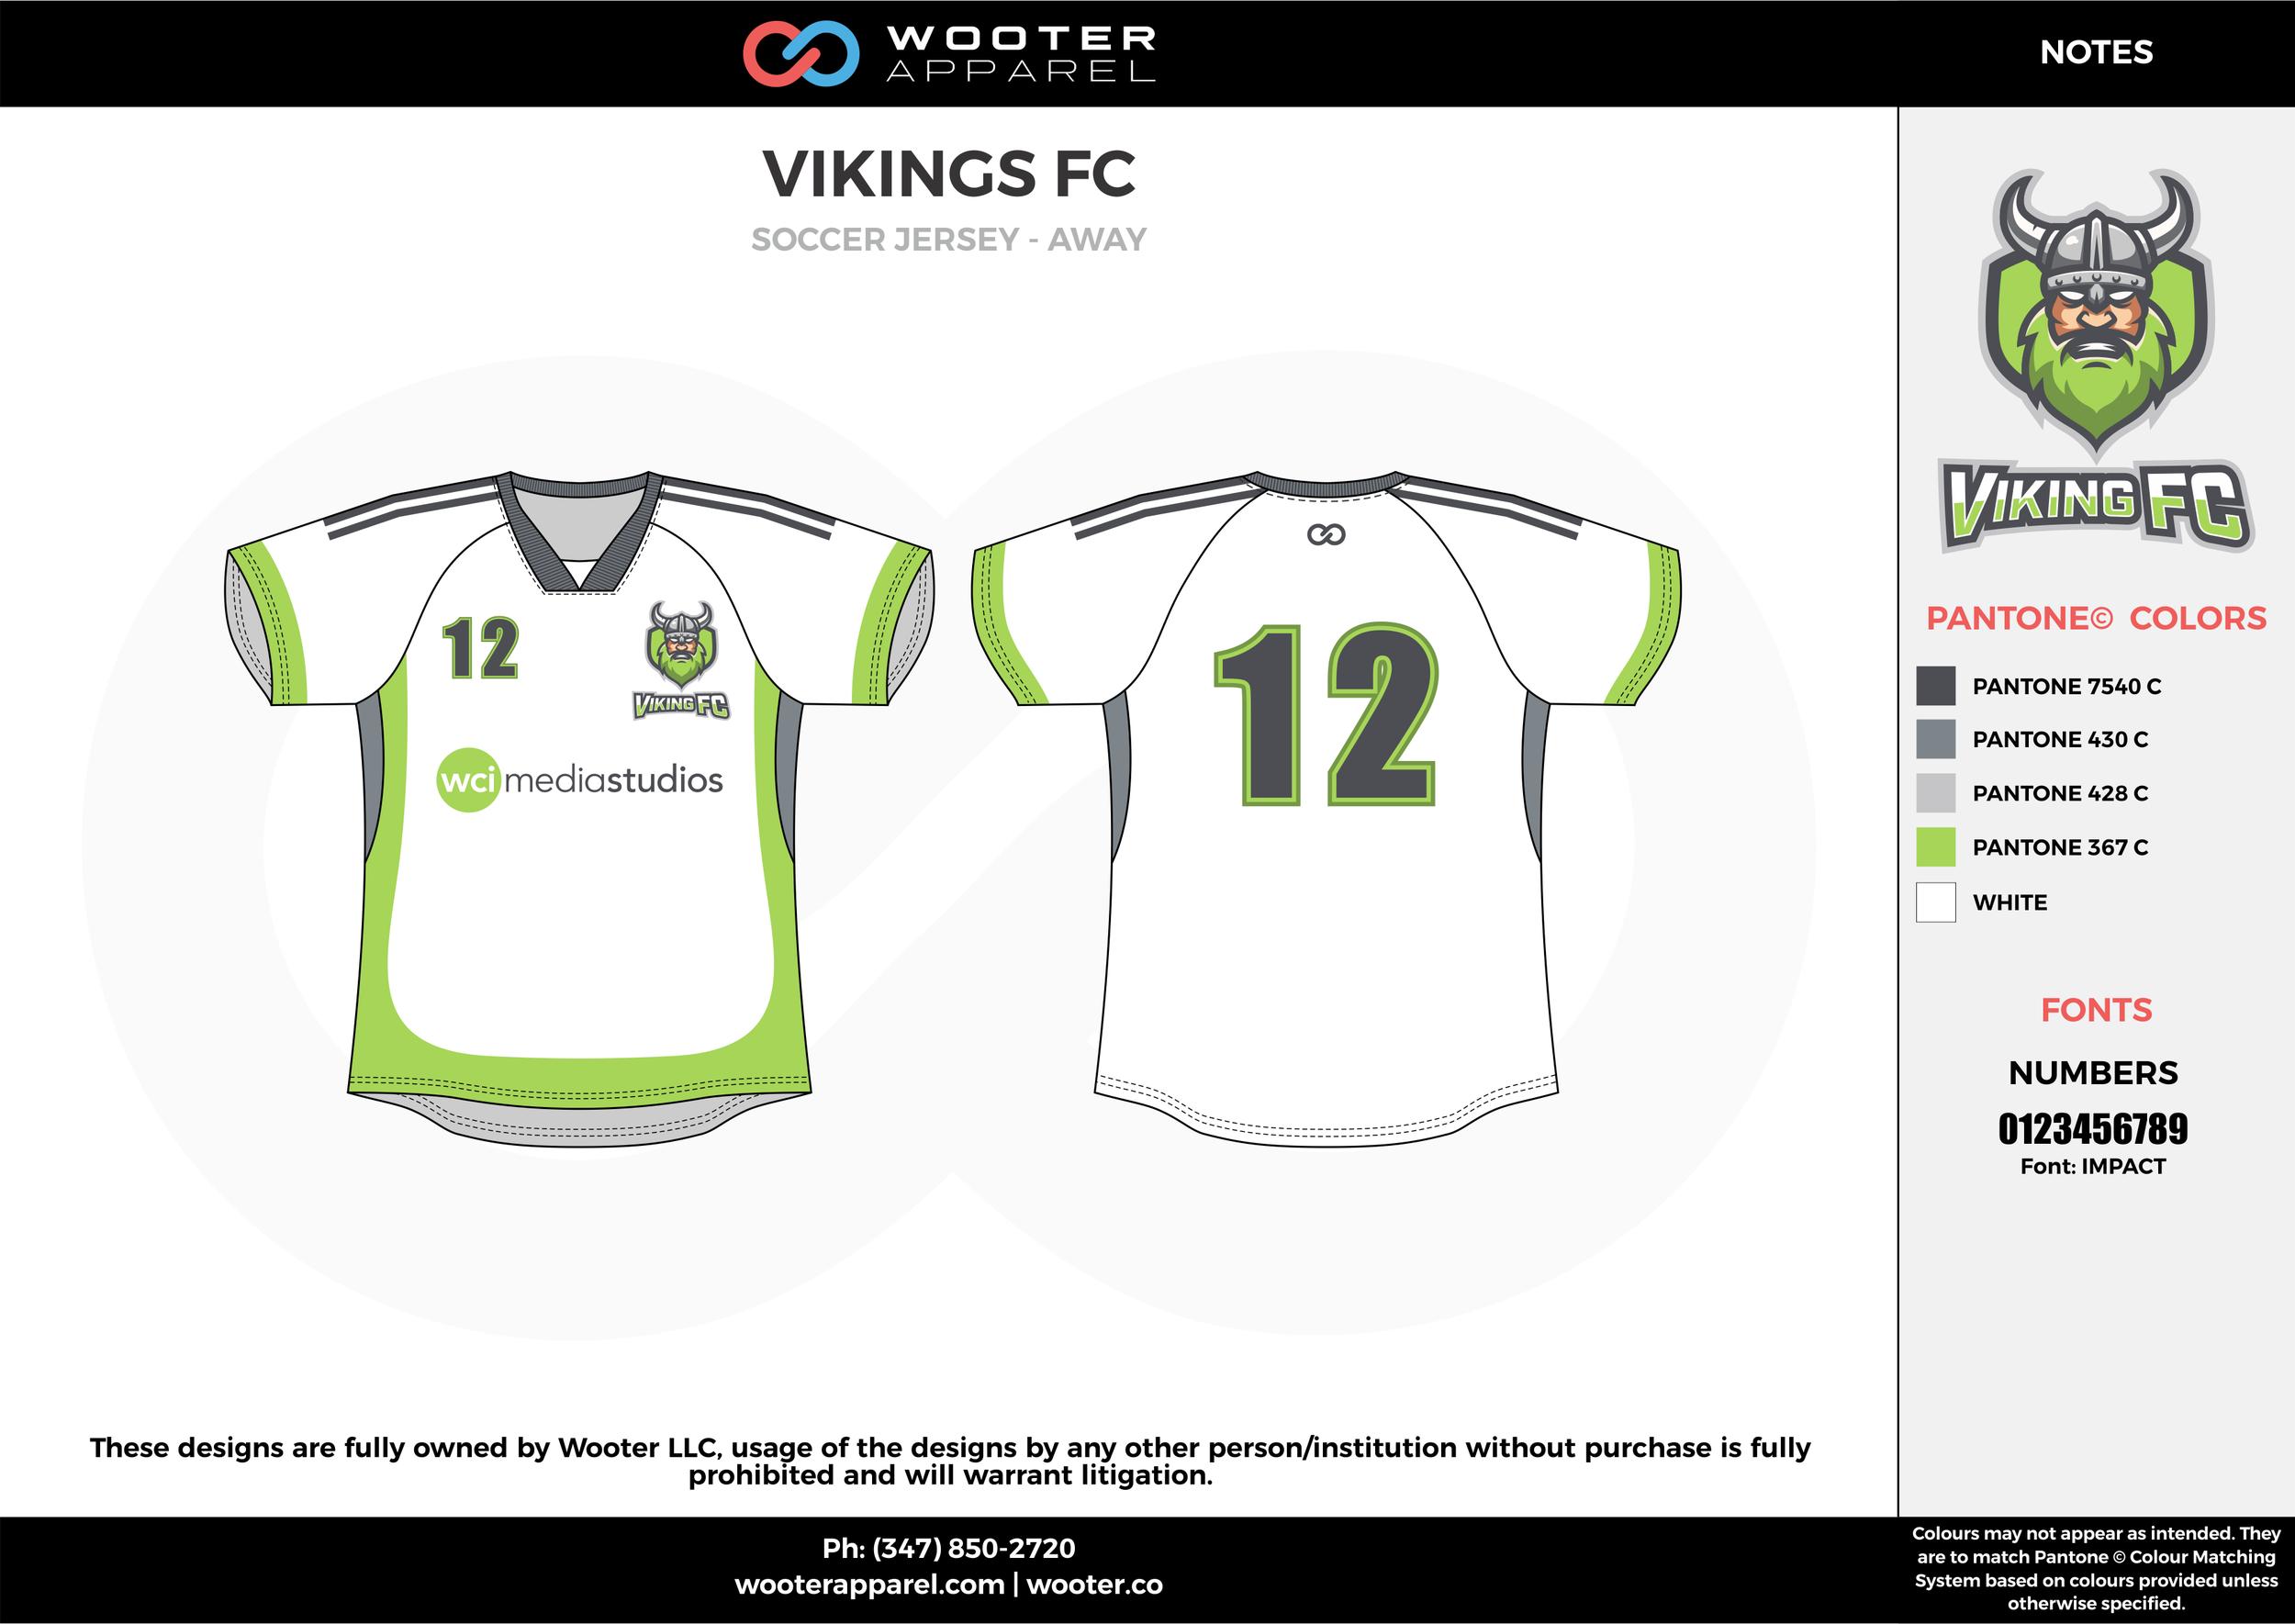 VIKINGS FC gray white green custom sublimated soccer uniform jersey shirt